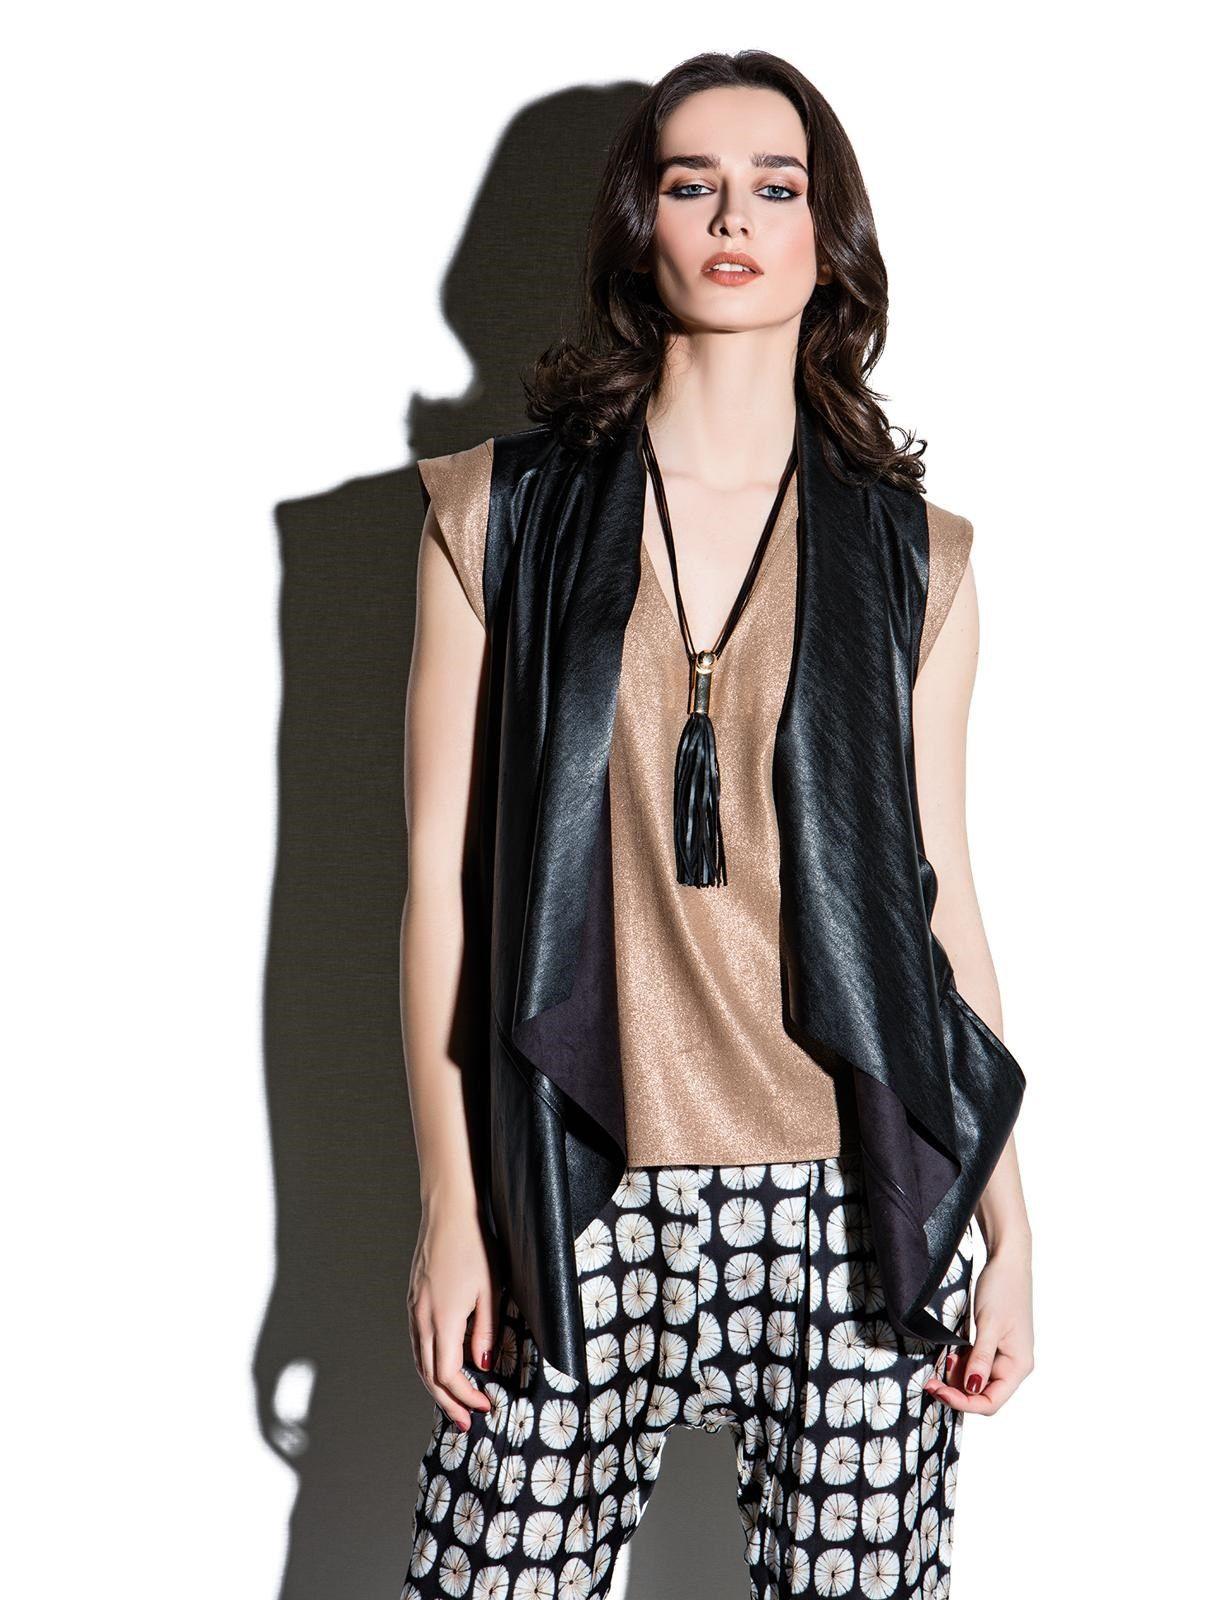 Operà Fashion - Spring Summer 2016